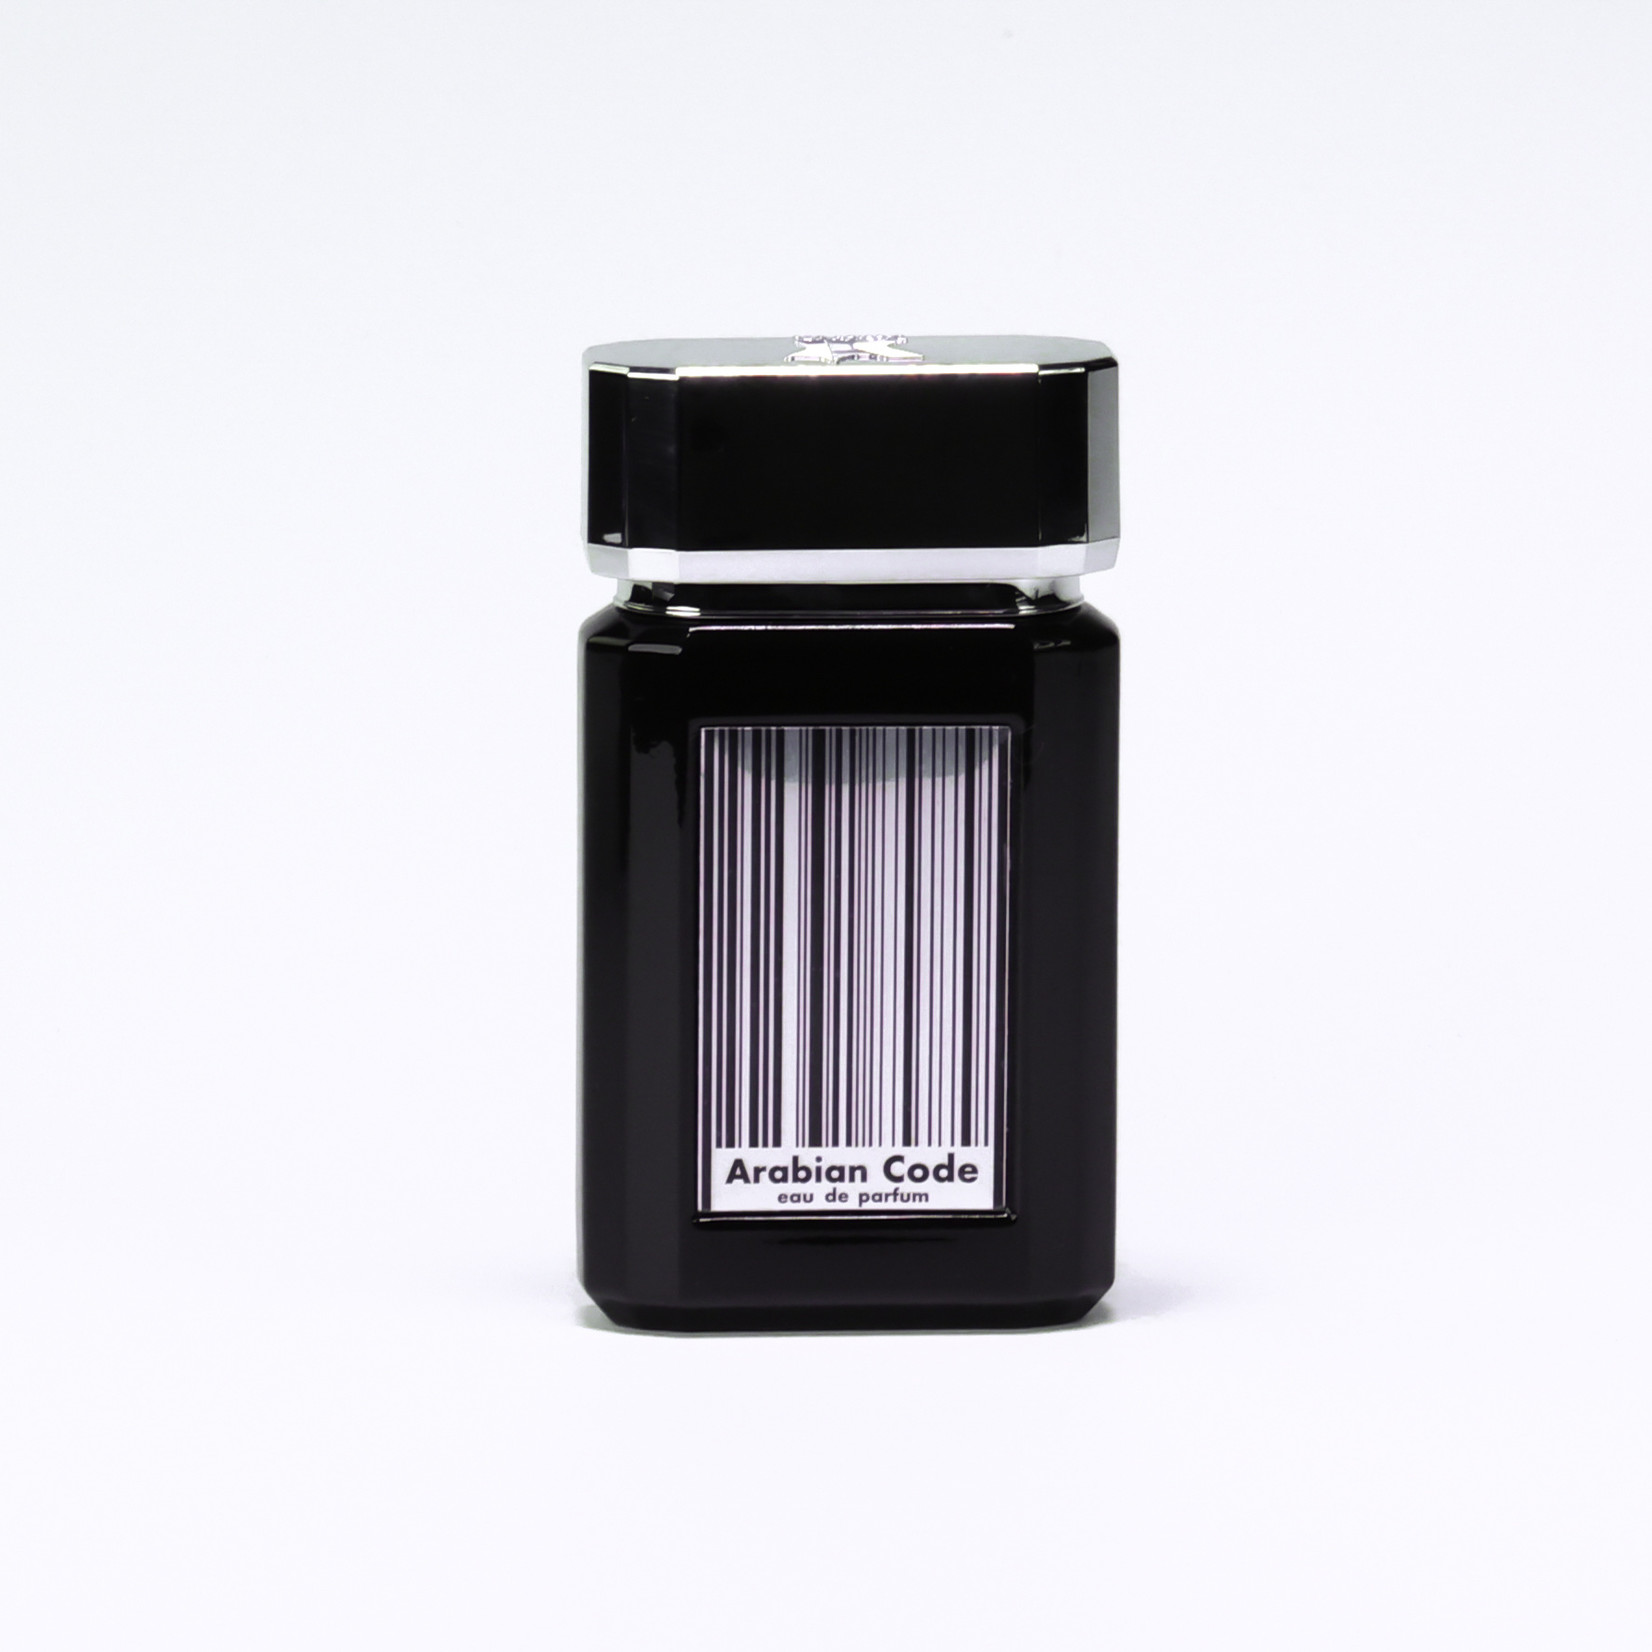 Arabian Oud Arabian Code (90ml Eau de Parfum)